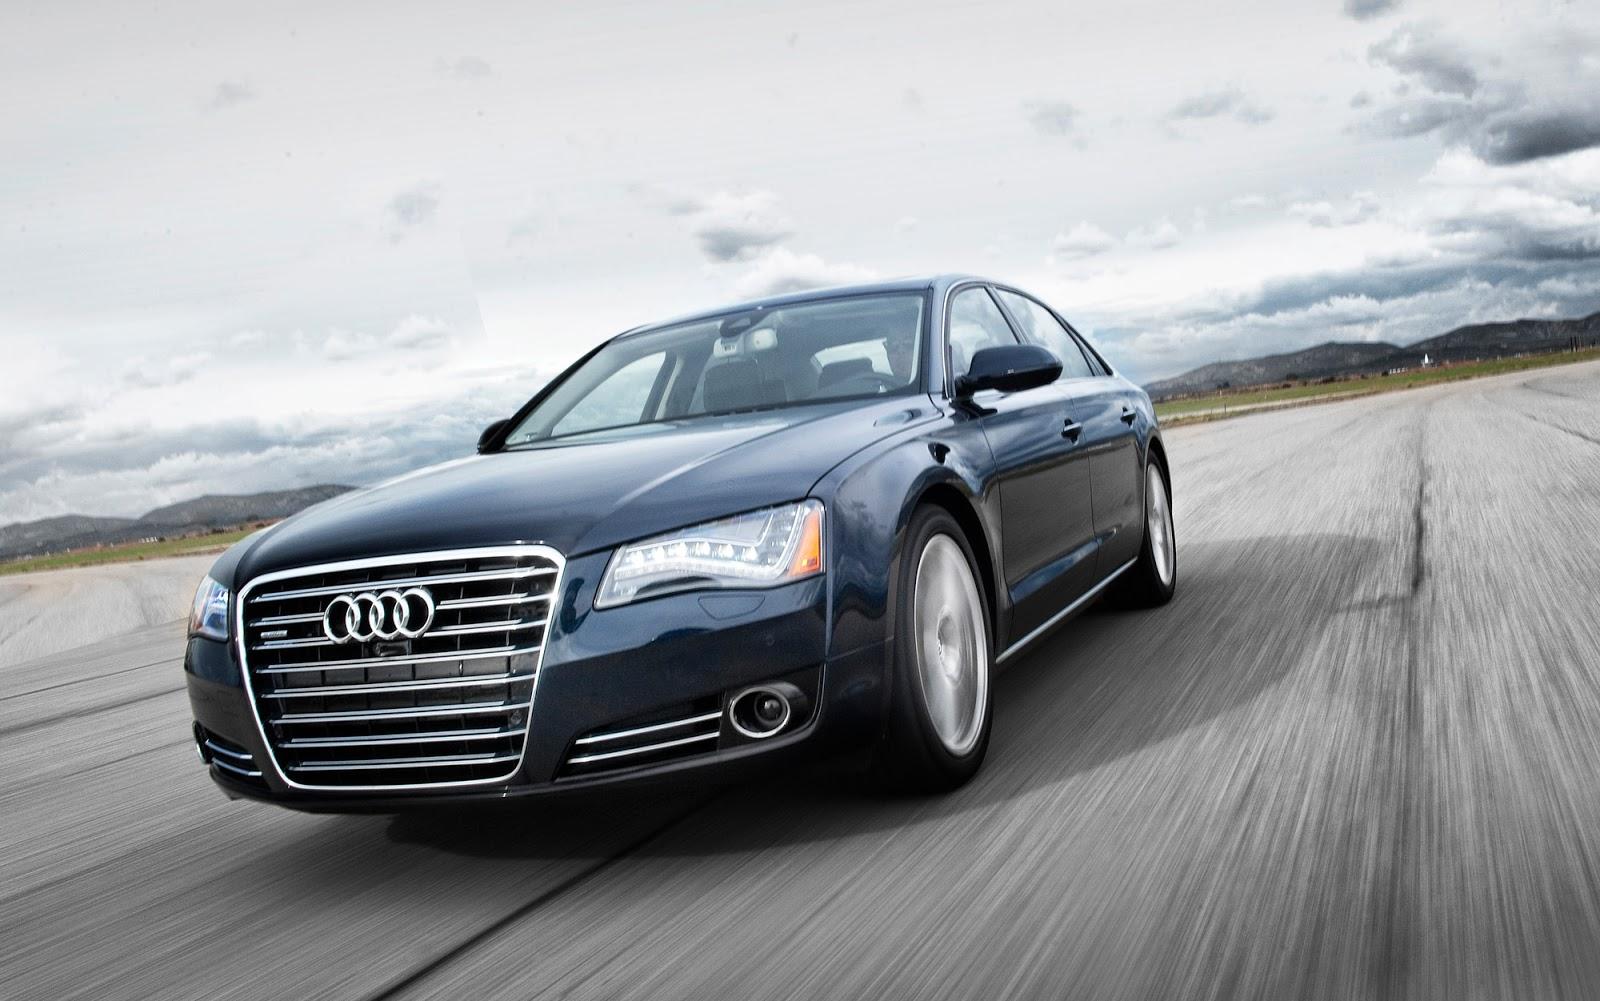 Foto Audi A8 L